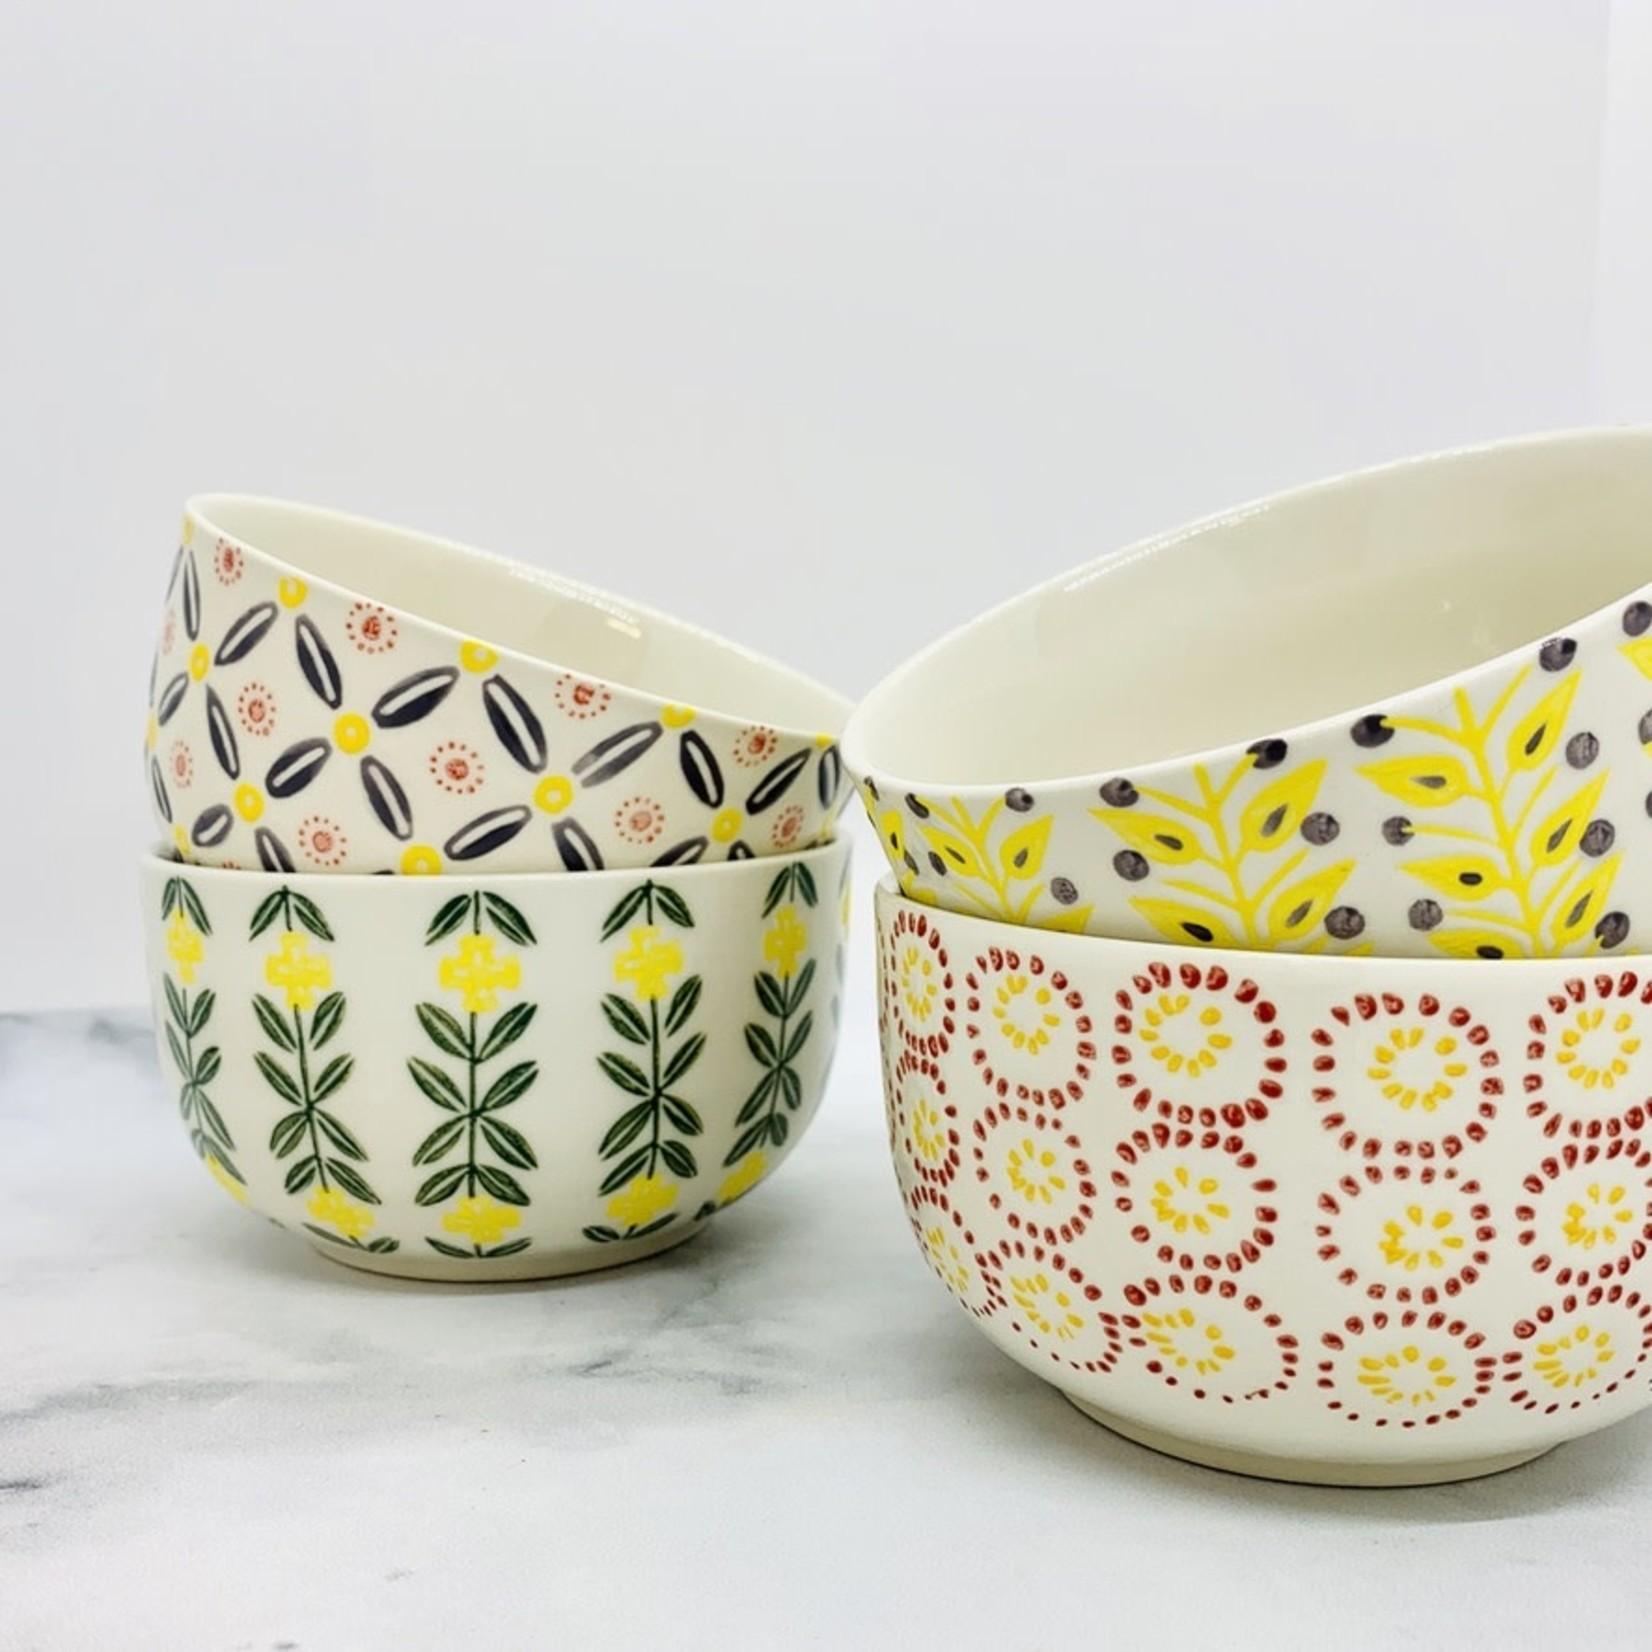 "4.75"" x 2.5"" Hand-Stamped Stoneware Bowl"